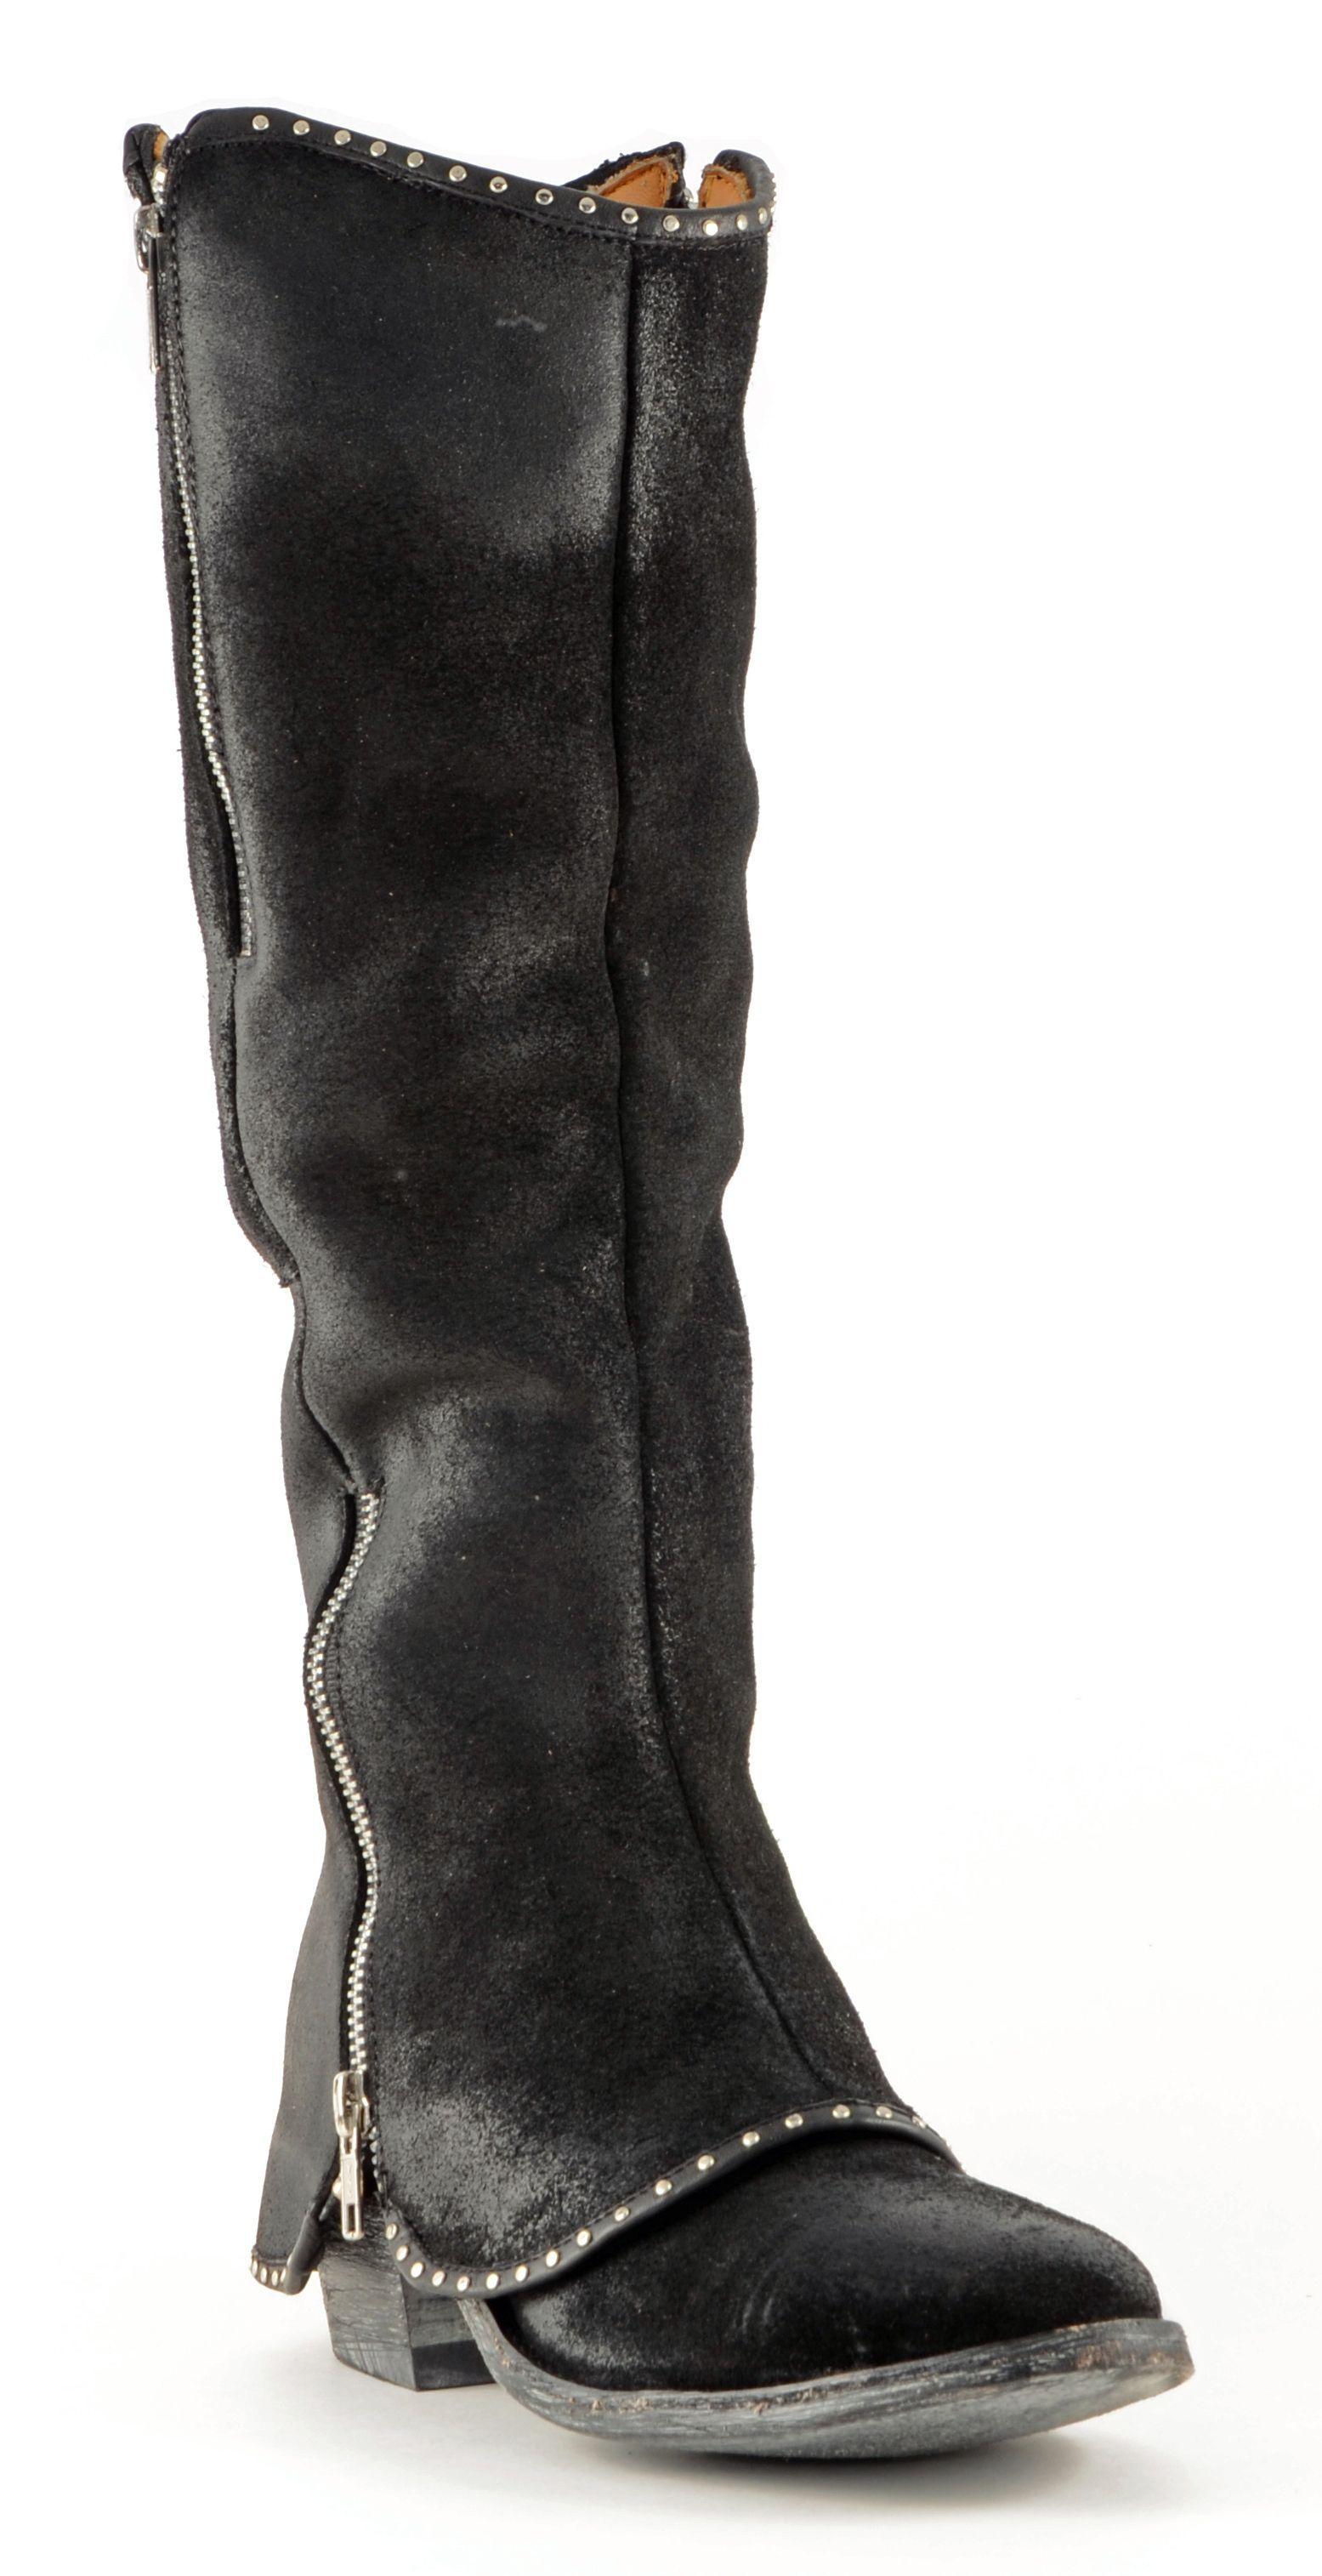 59b54b64b Womens Old Gringo Josefa Boots Black Style L1264-2 | Old Gringo | Allens  Boots